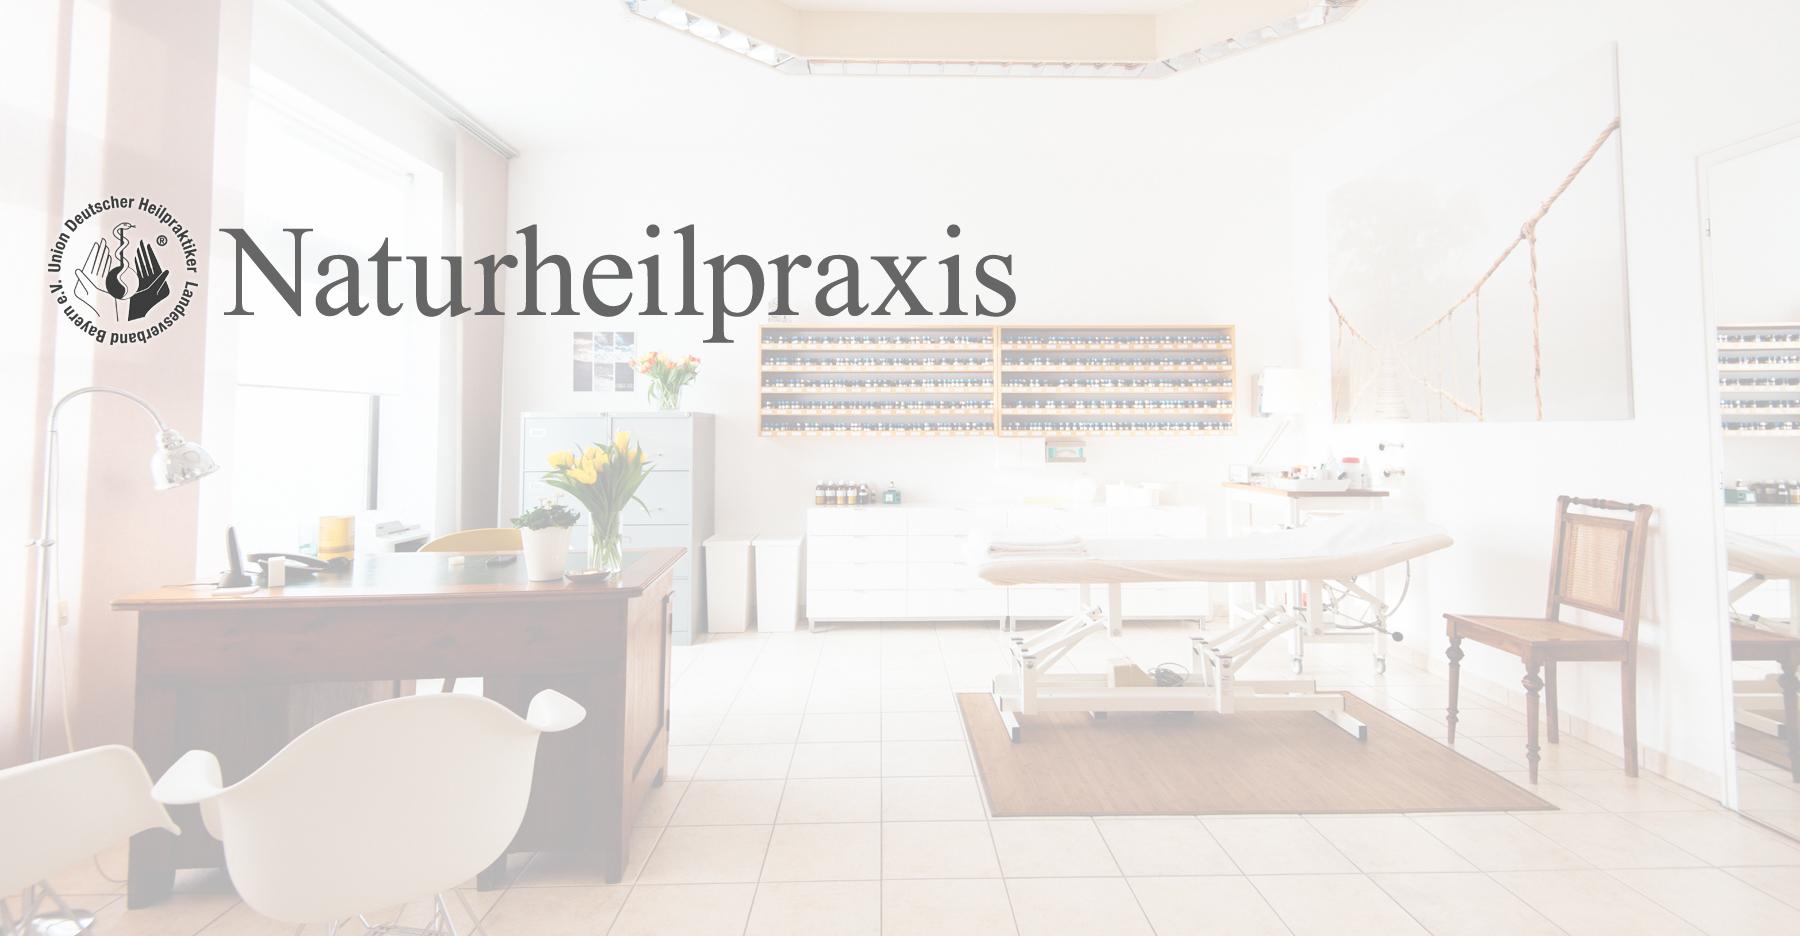 Naturheilpraxis_Pattberg_Herrsching_start